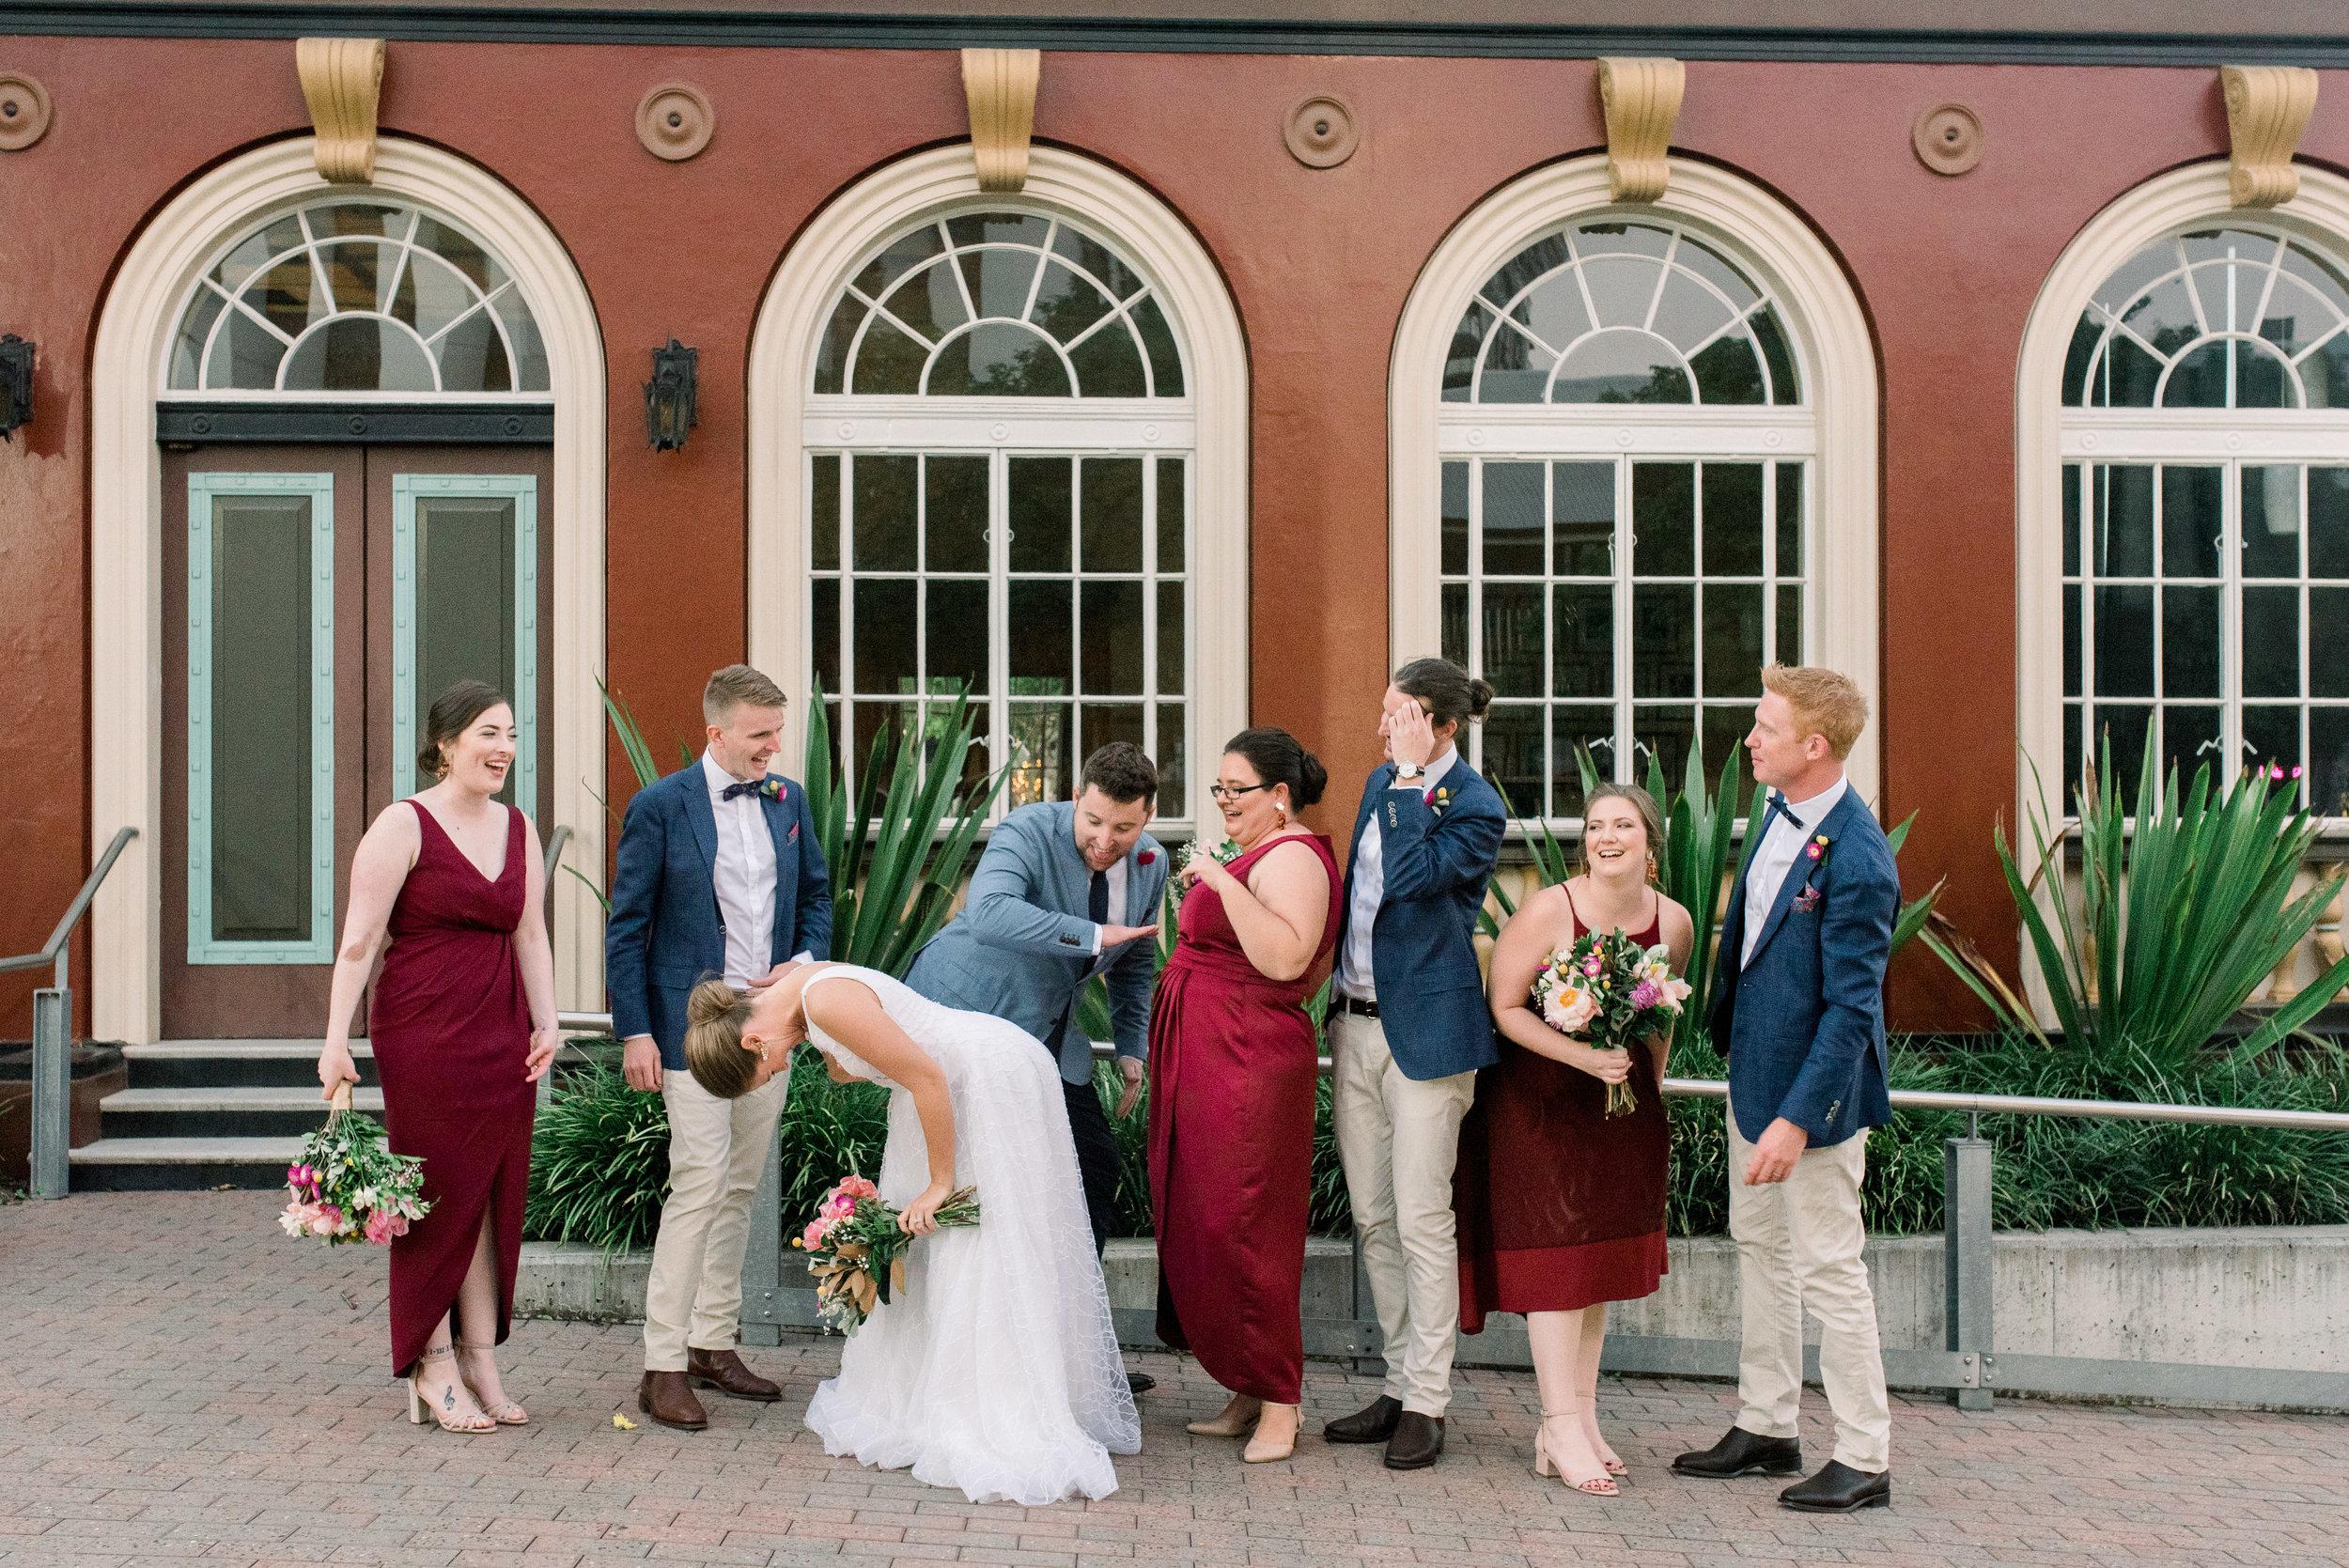 refinery-wedding-brisbane-city-wedding-photographer-76.jpg